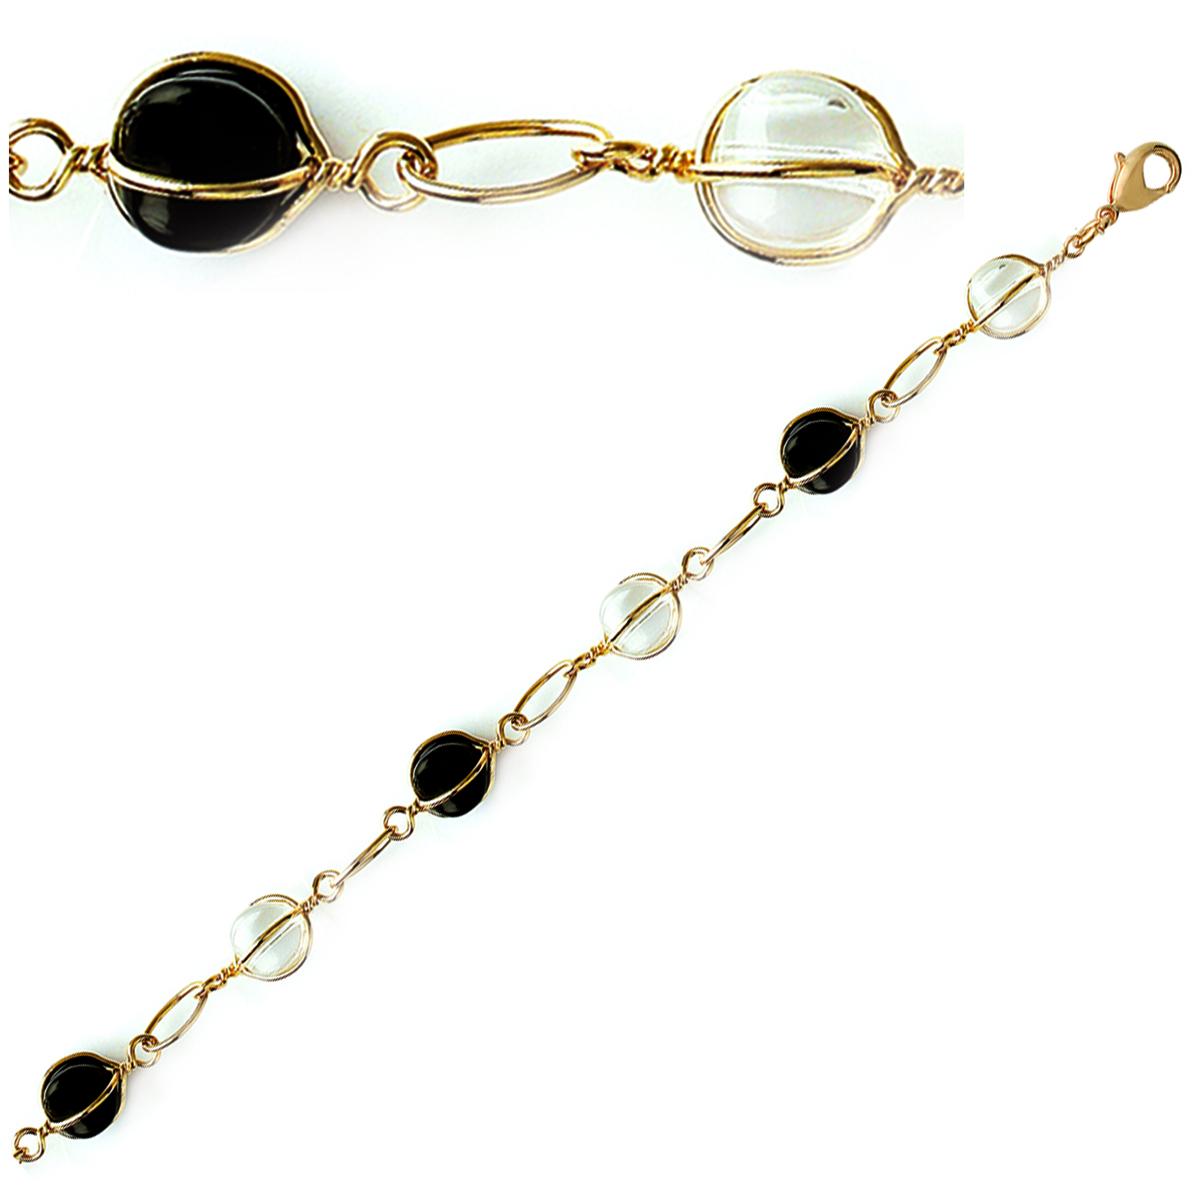 Bracelet Plaqué Or \'Alegria\' Noir Blanc doré - 10 mm - [E7049]